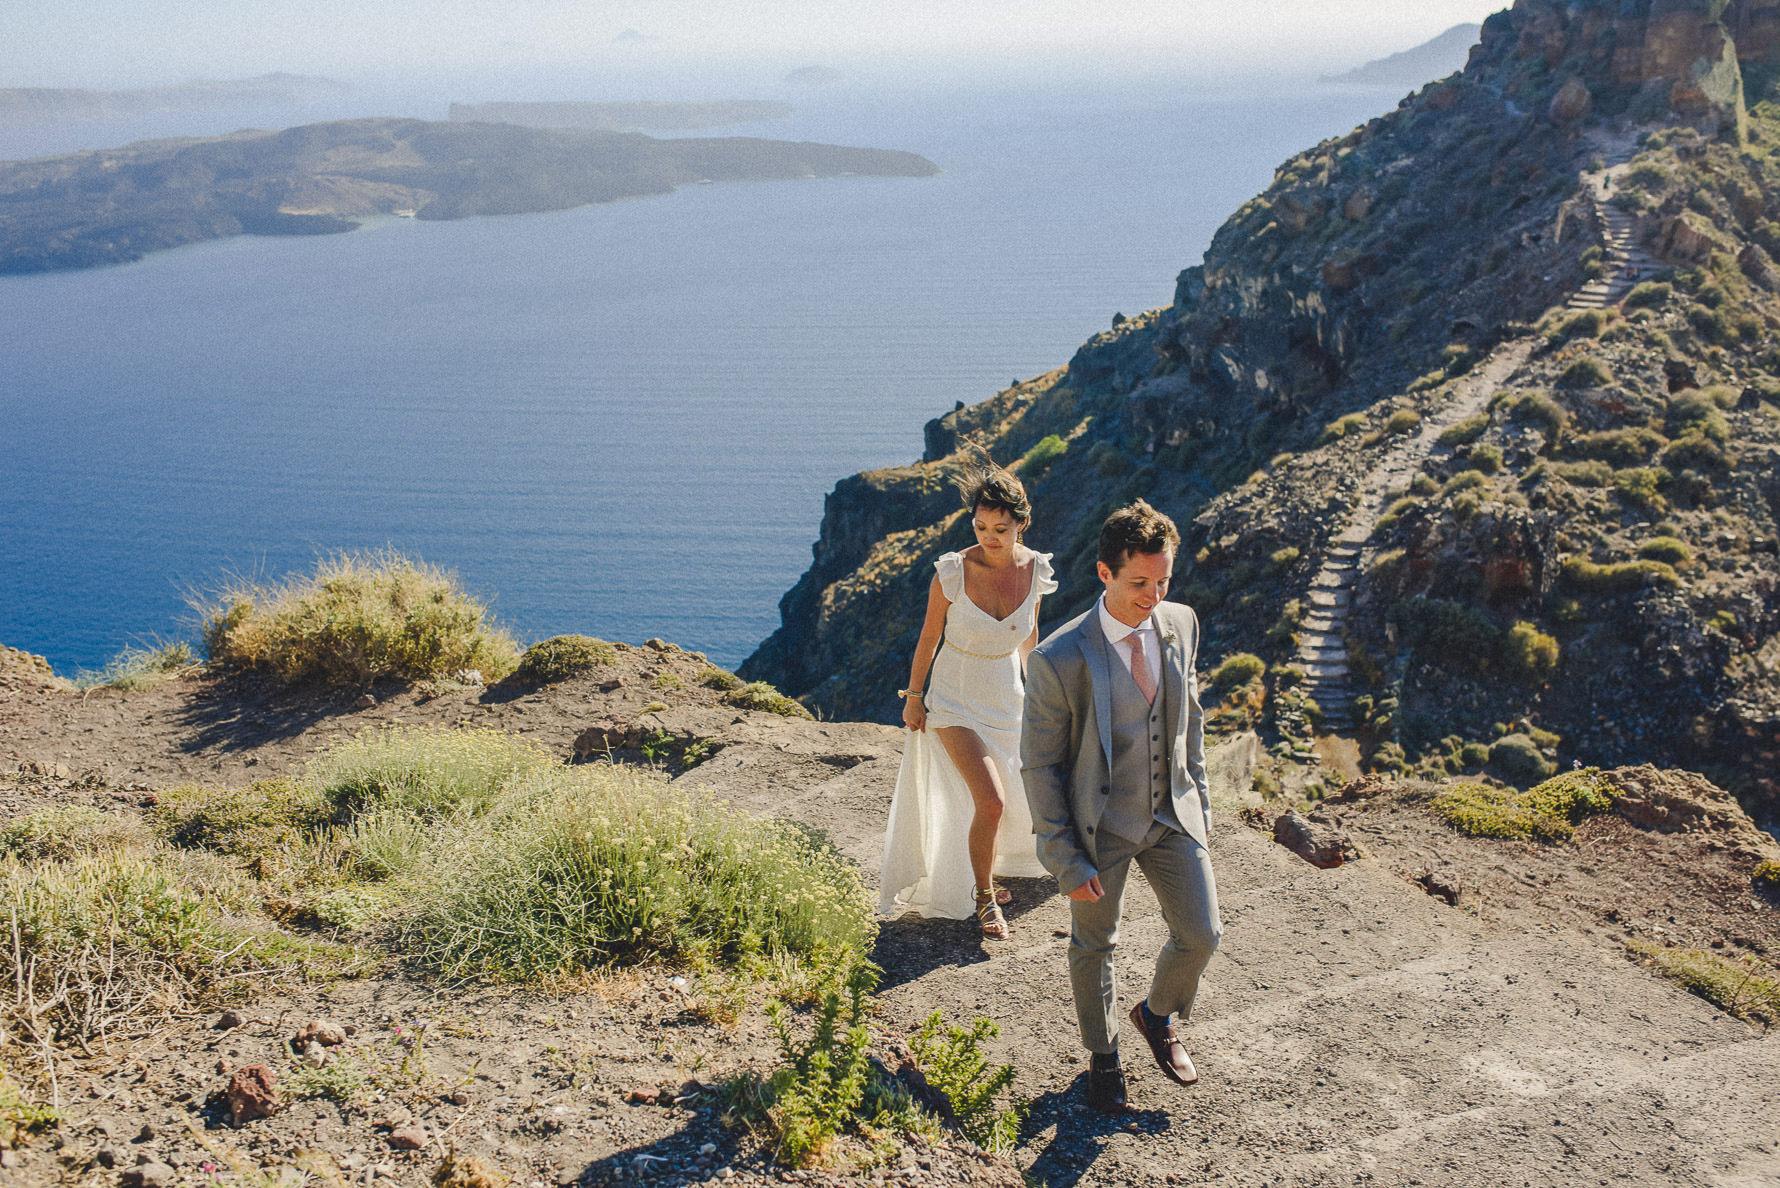 santorini wedding photographer livio lacurre